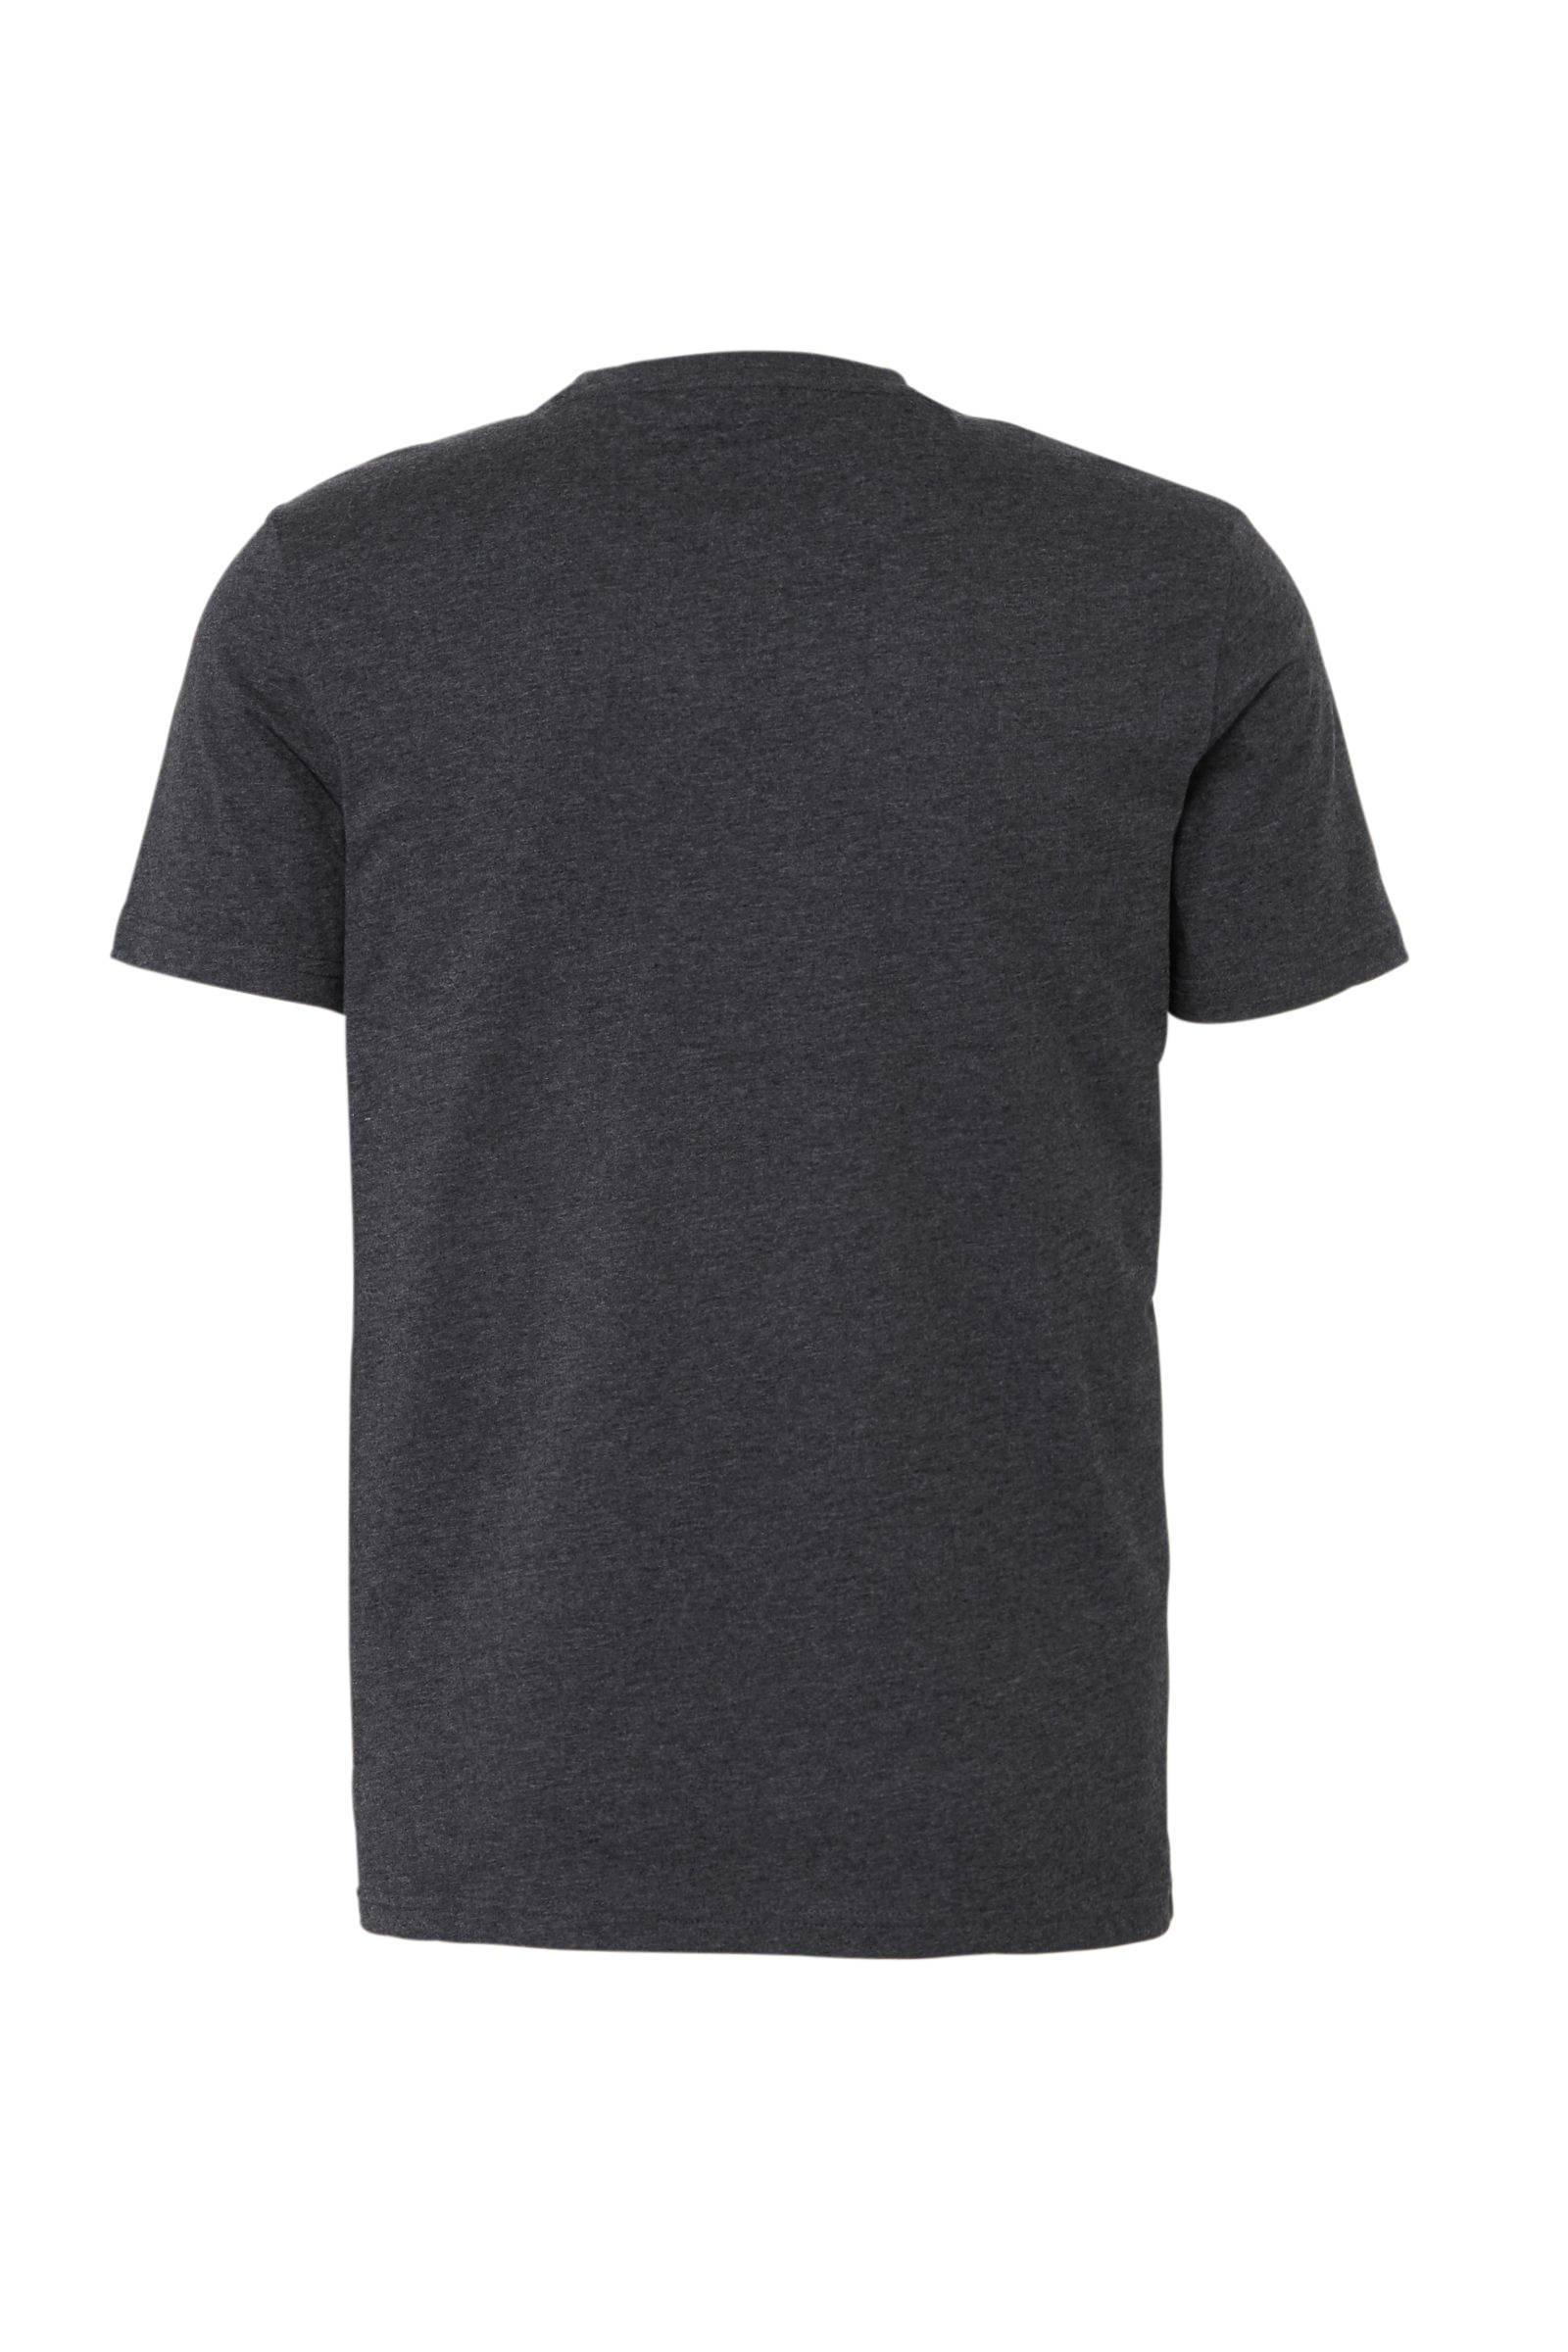 sport shirt Scott Lyle antraciet T nwq8BB5xY